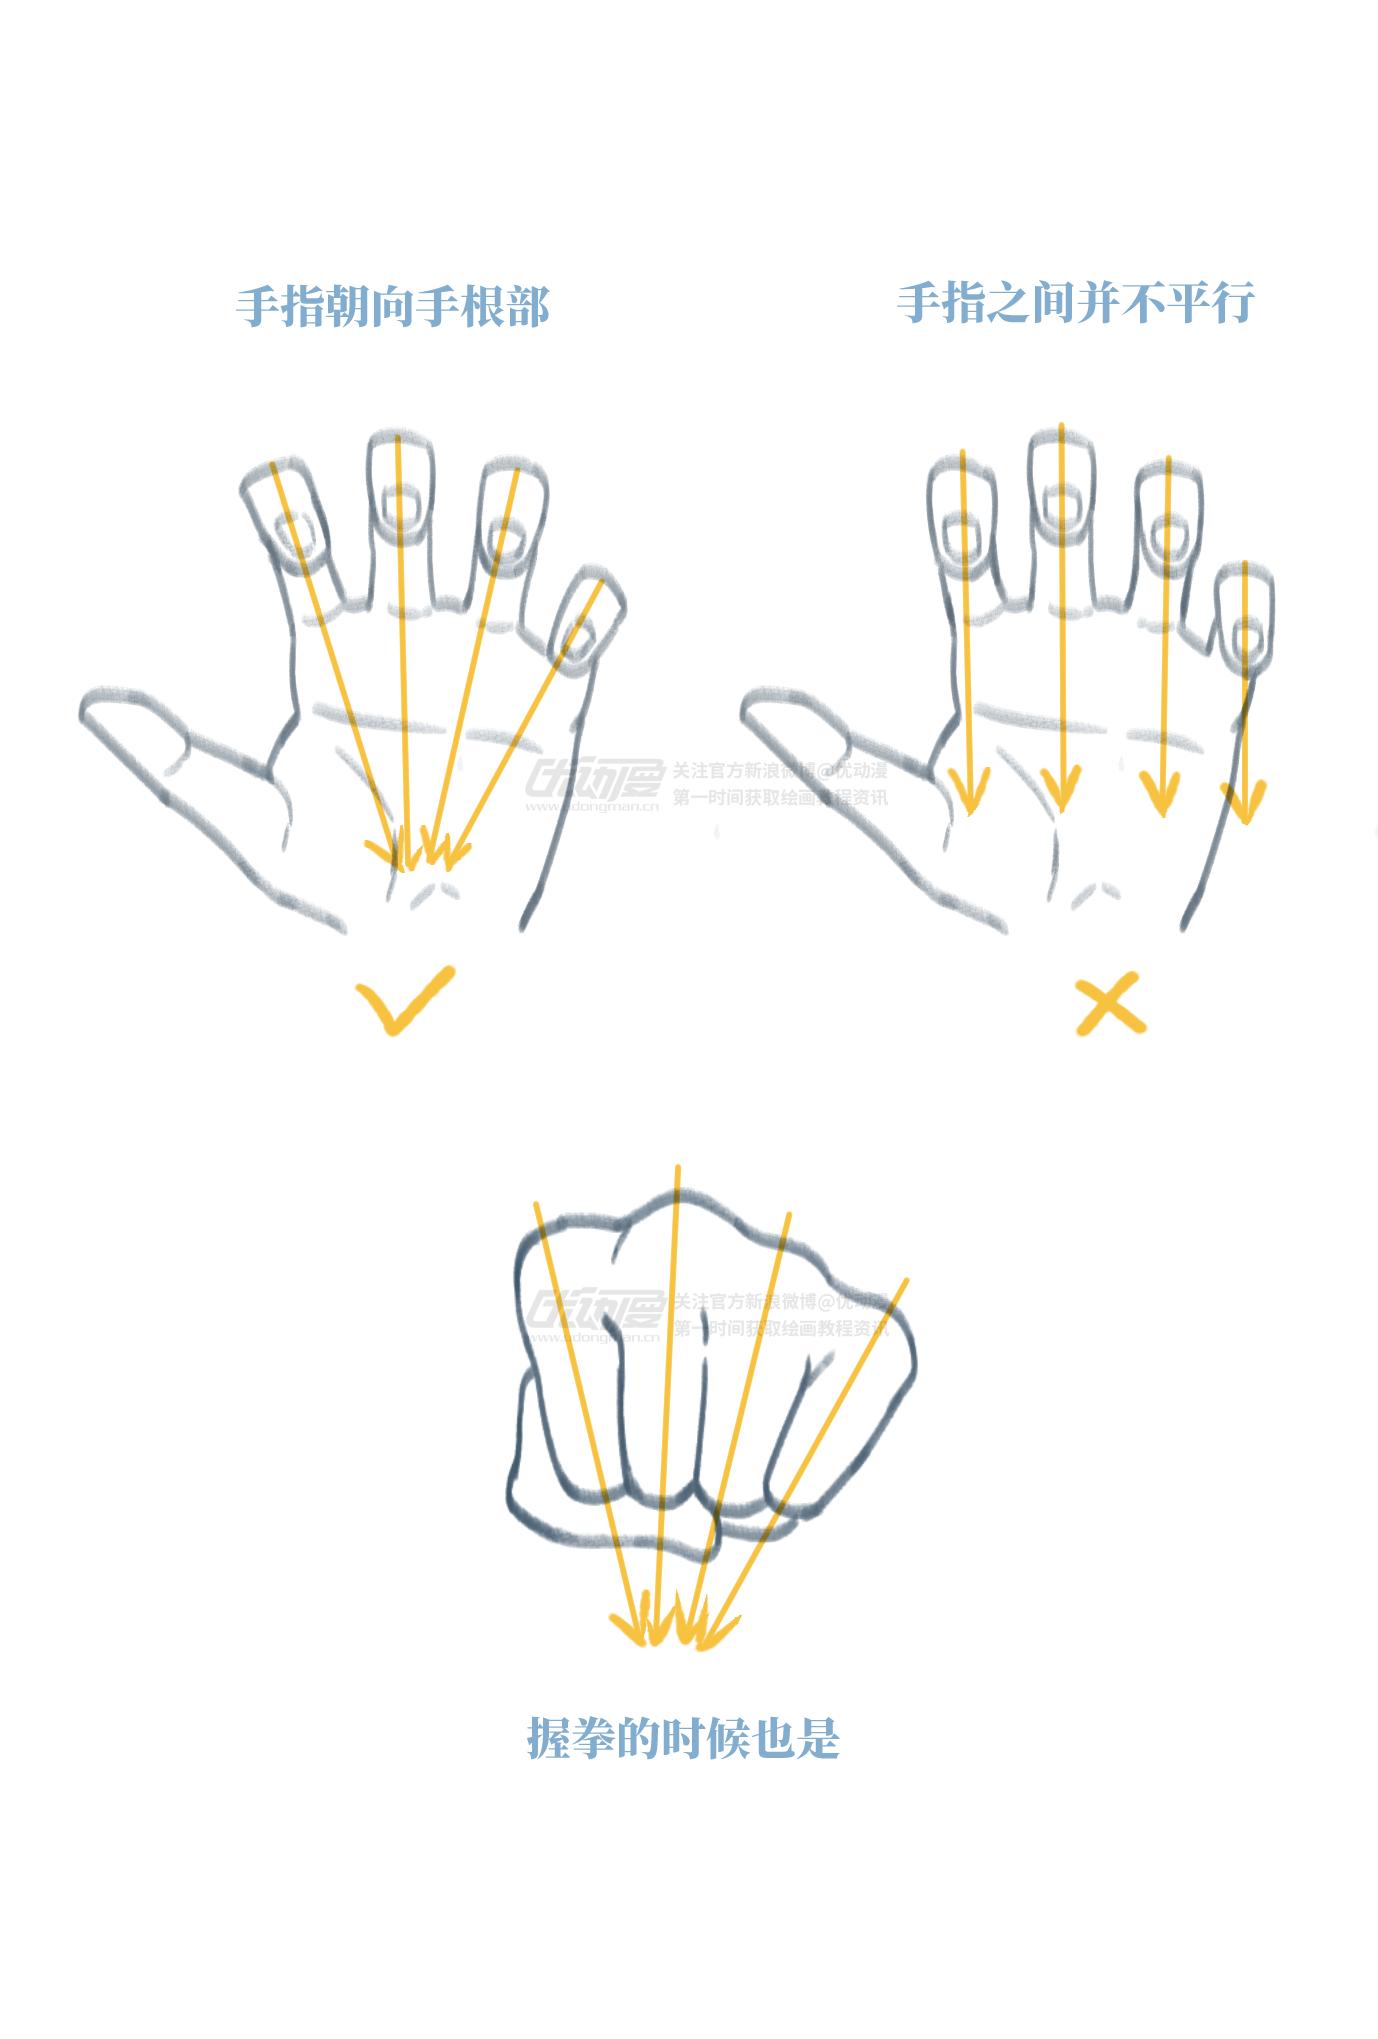 手的基础画法5.png